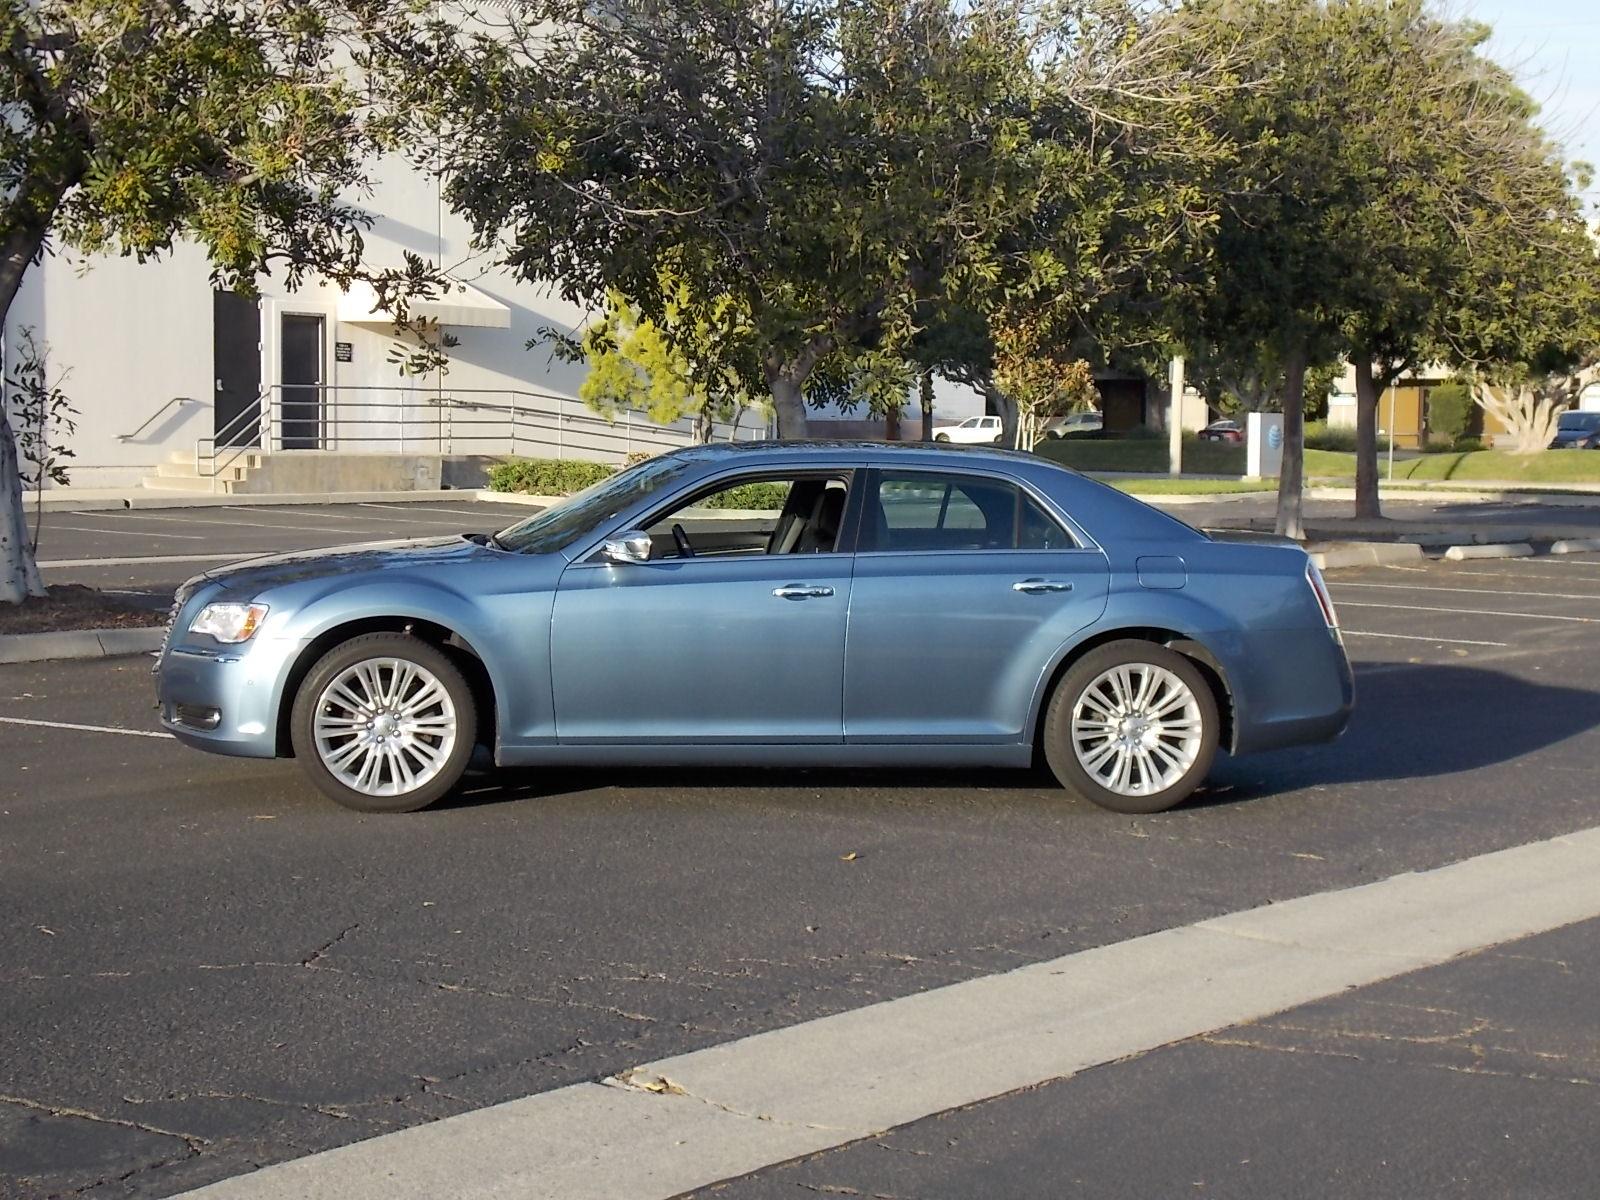 2011 Chrysler 300 Pictures Cargurus